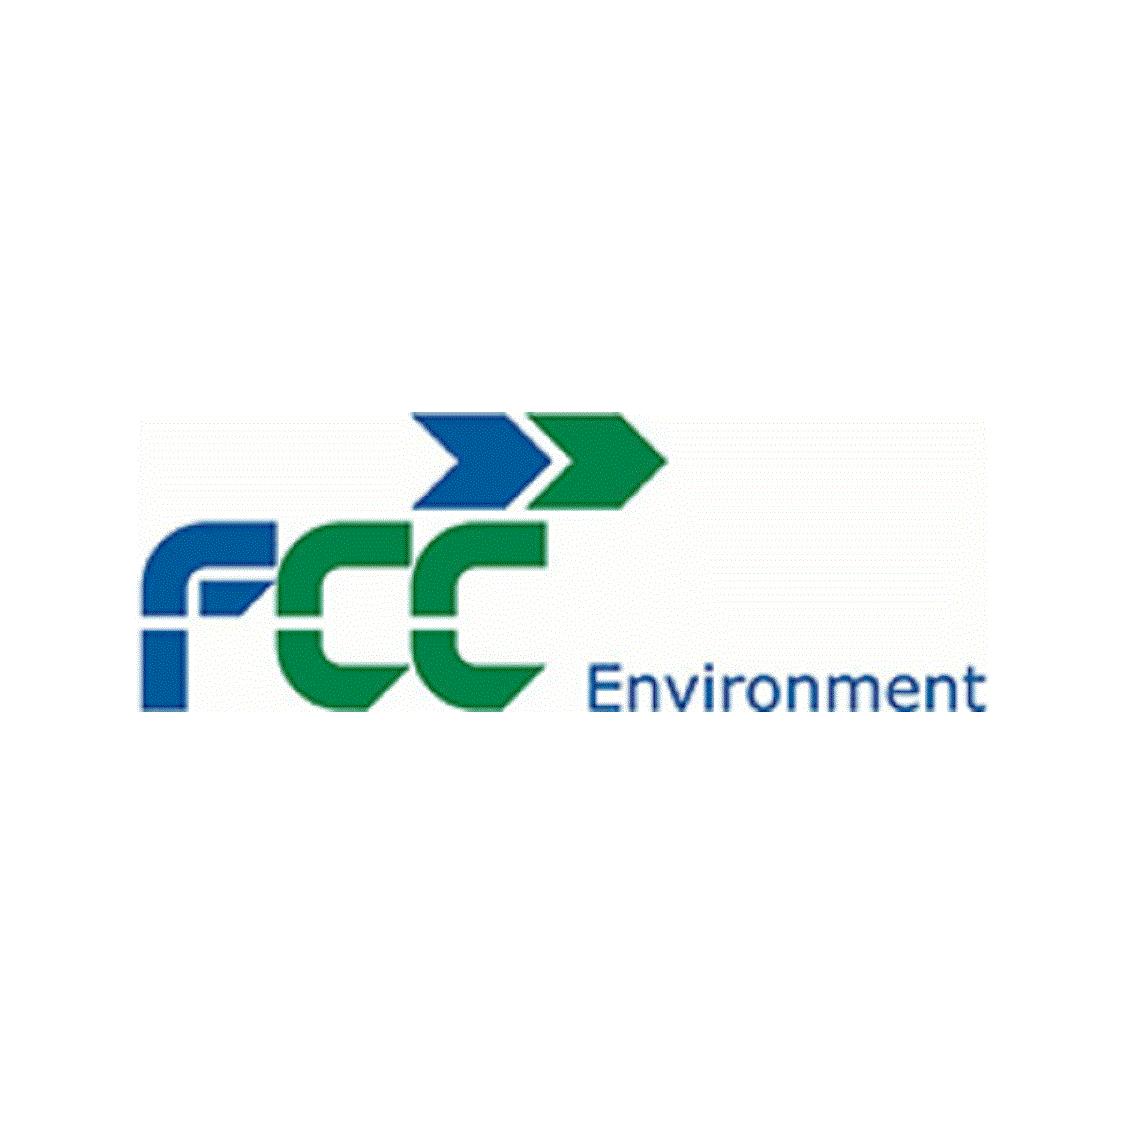 FCC Industrieviertel Abfall Service Gesellschaft m.b.H. & Co Nfg KG